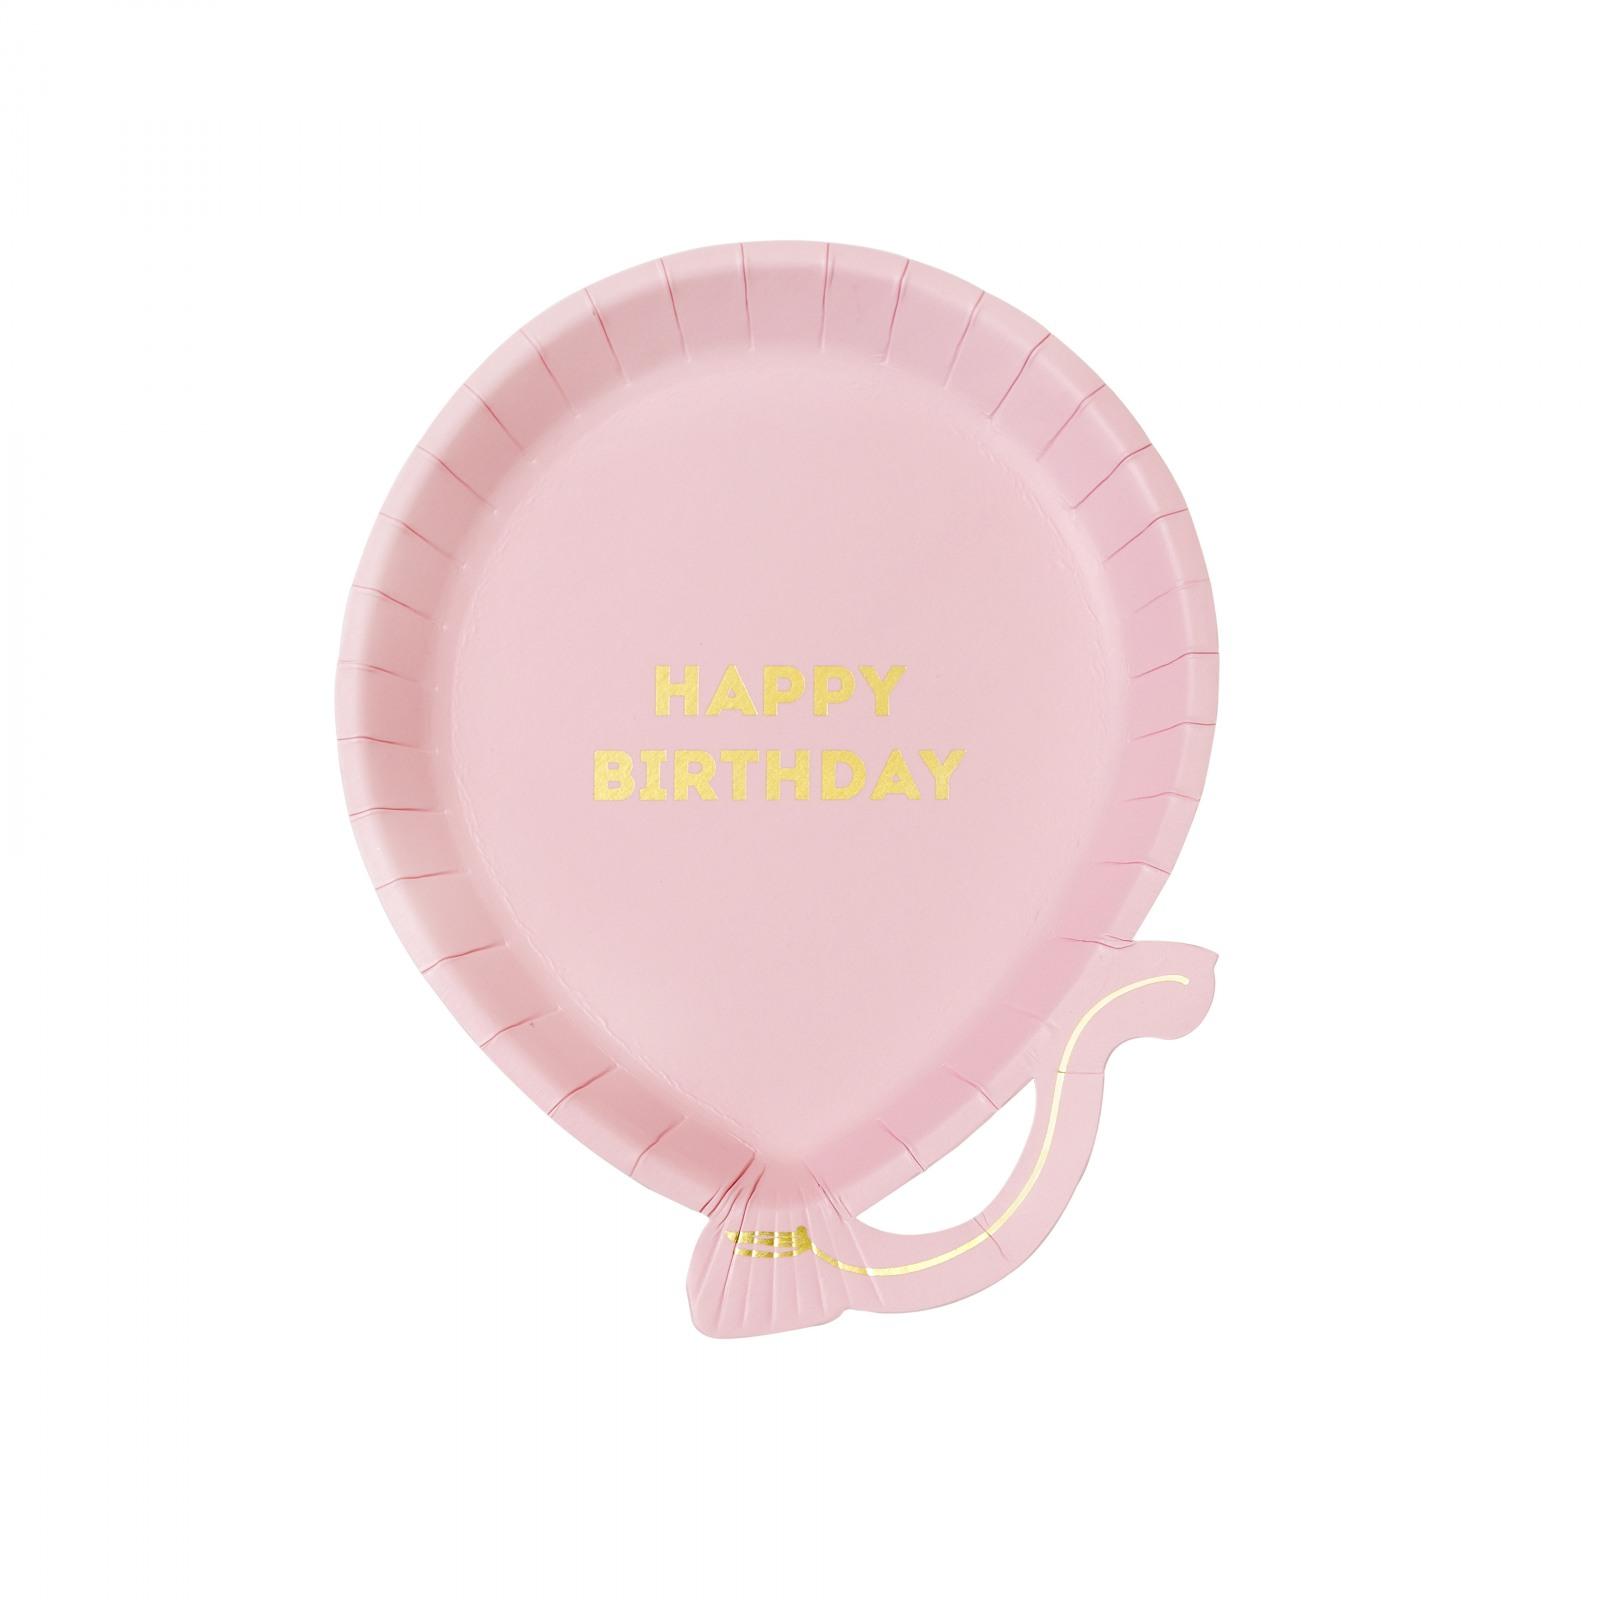 Pink Happy Birthday Balloon Shaped Plates